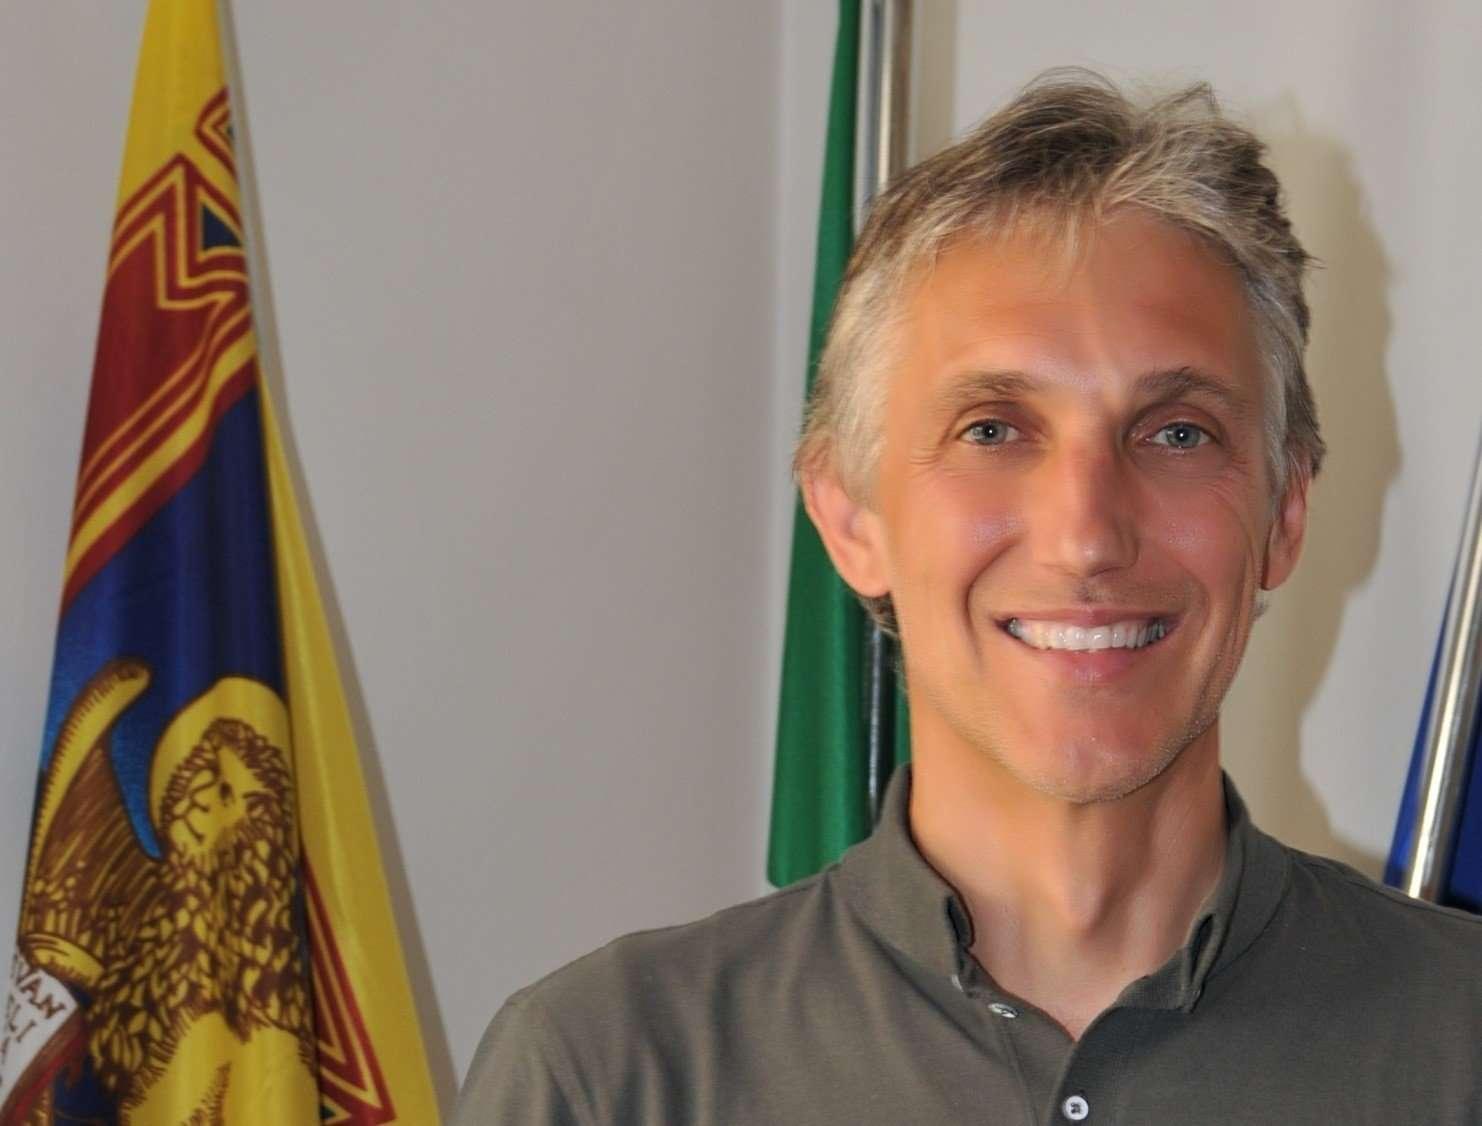 Gianmichele Bianco (Foto Nicola Cobianchi)